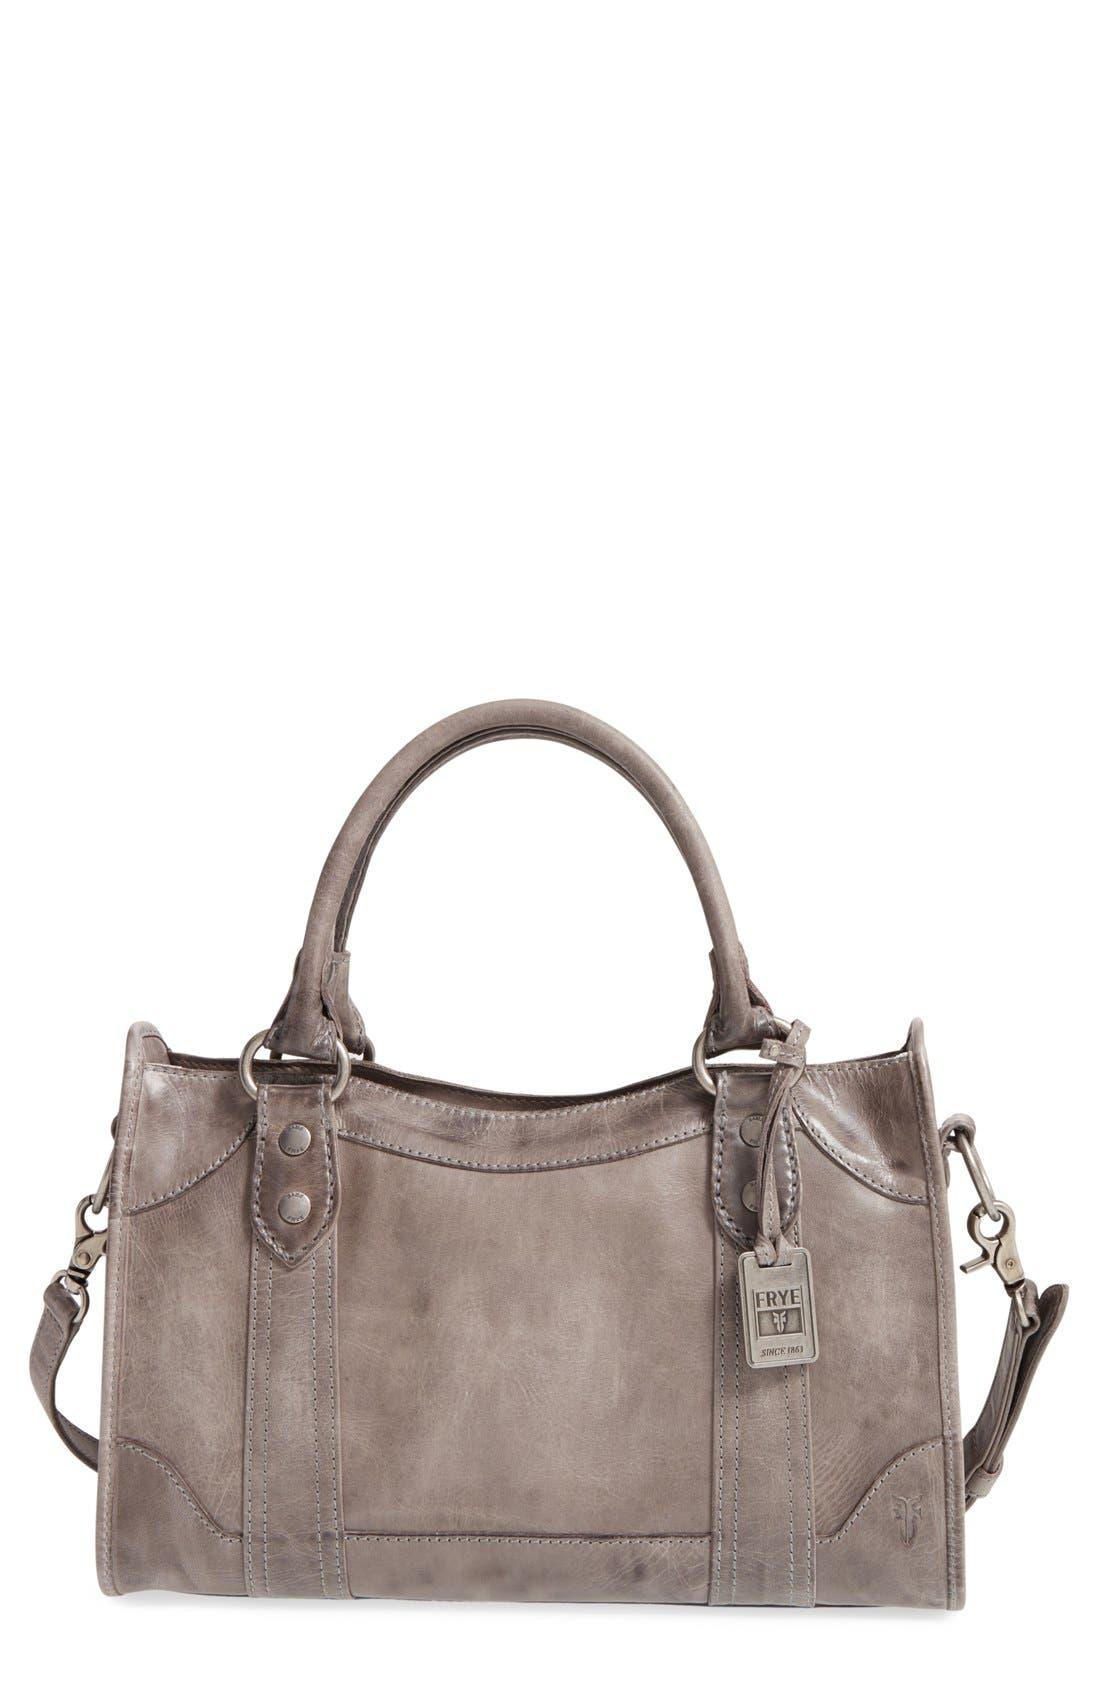 FRYE 'Melissa' Washed Leather Satchel, Main, color, ICE